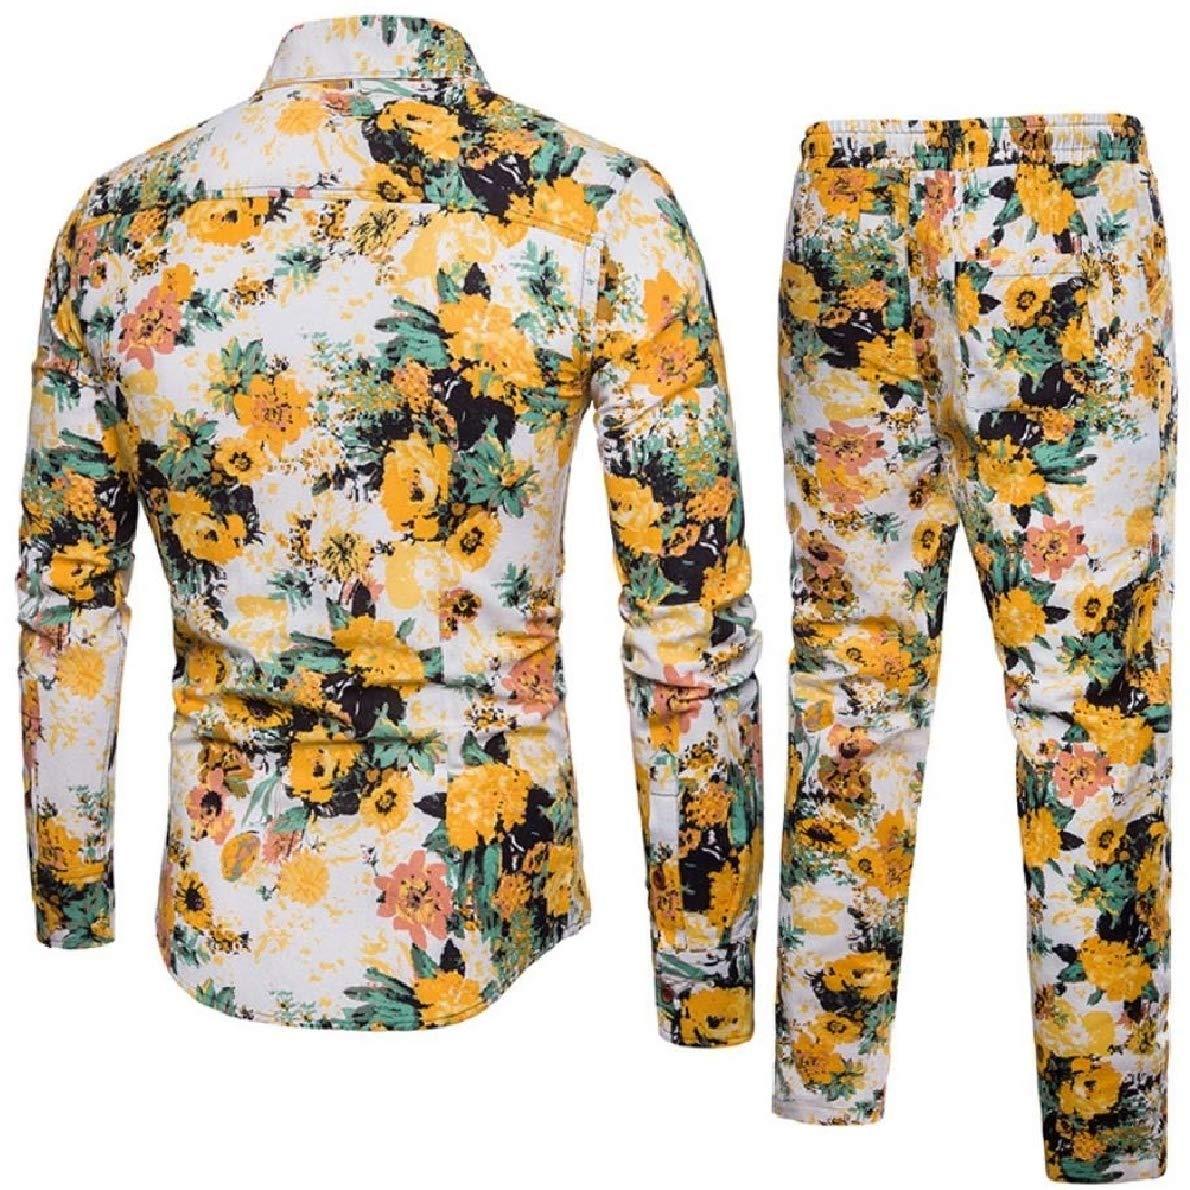 Zimaes-Men Linen Trousers Floral T-Shirts Long Sleeve Casual 2 Piece Set